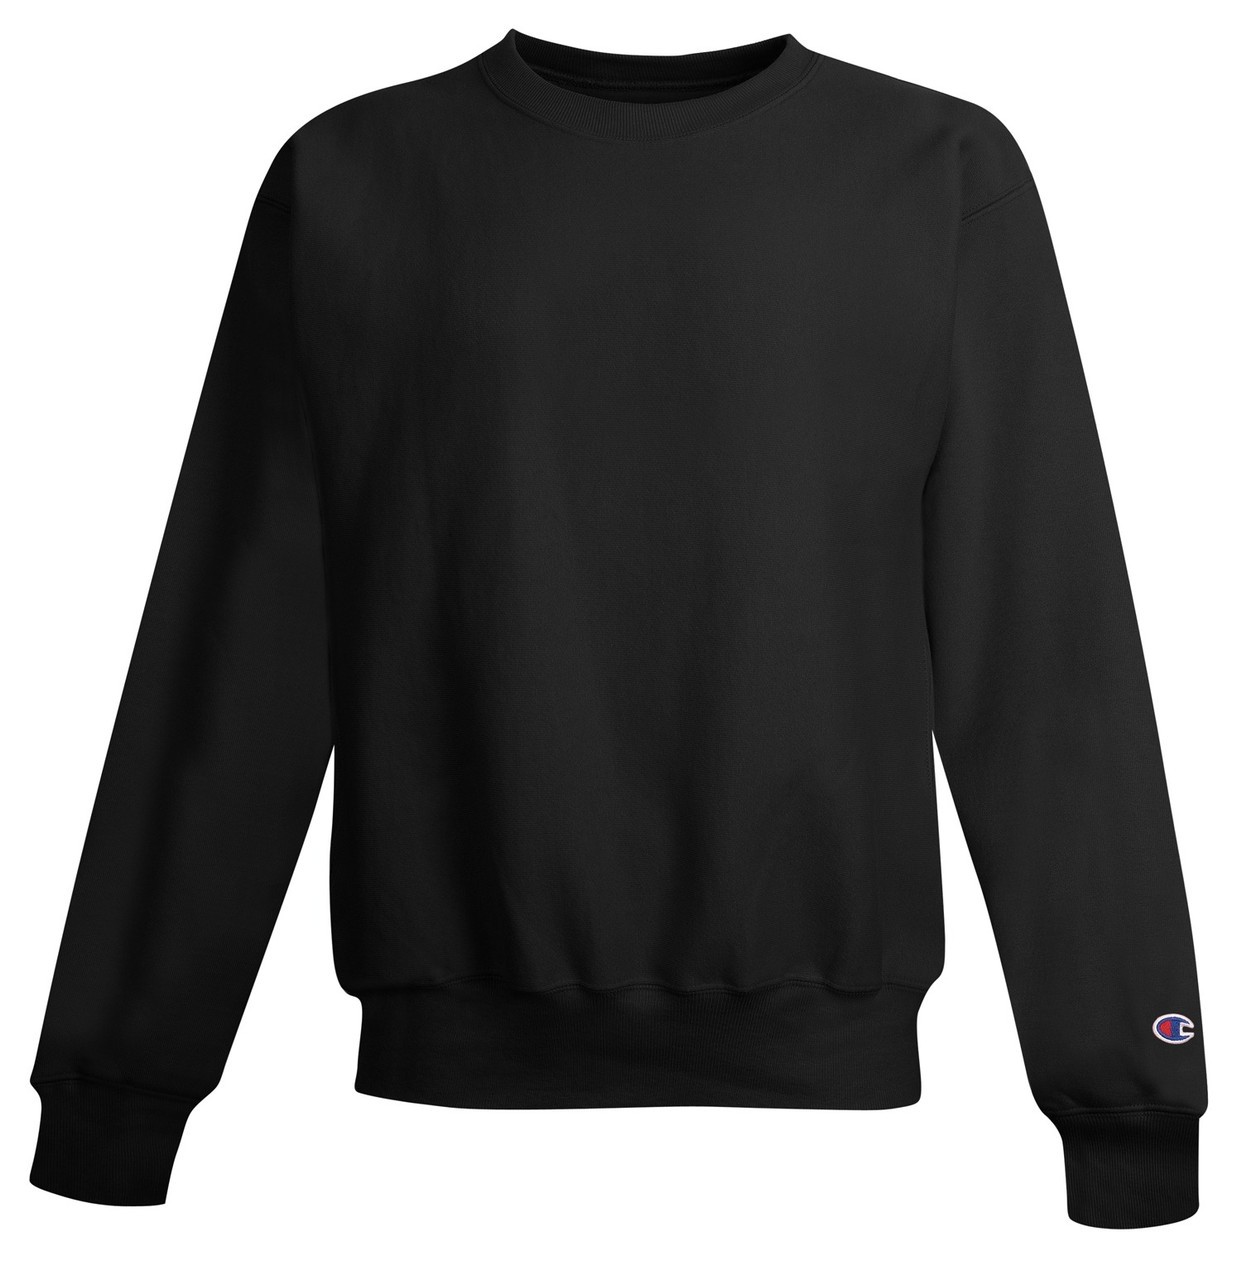 2dac2789 Black - Champion S149 Reverse Weave Fleece Crew | Athleticwear.ca